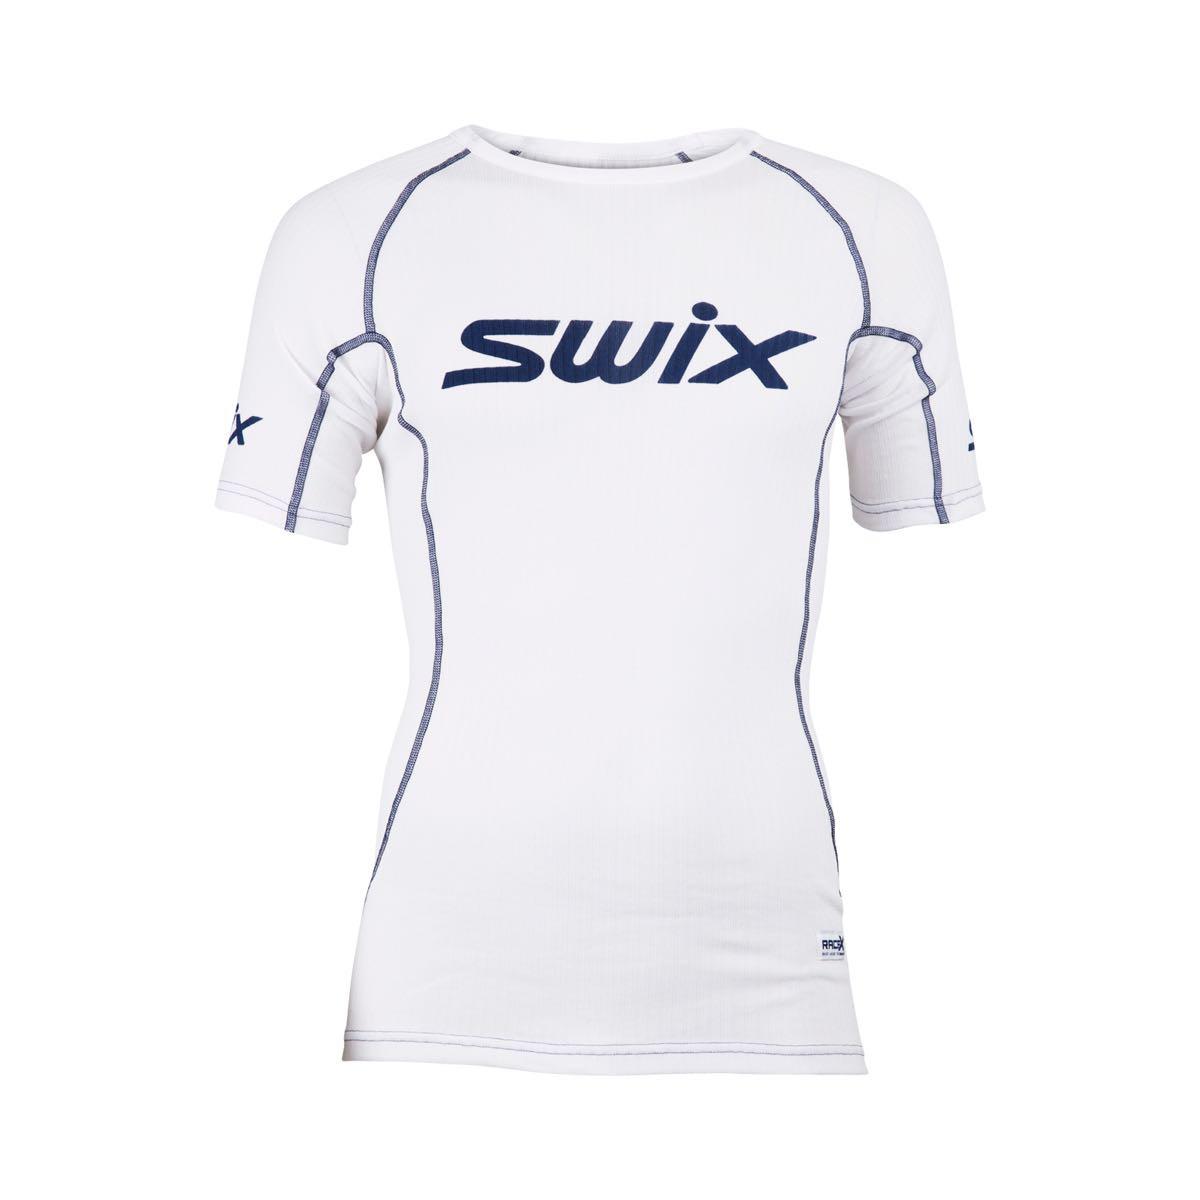 swix-40451-00000.jpg